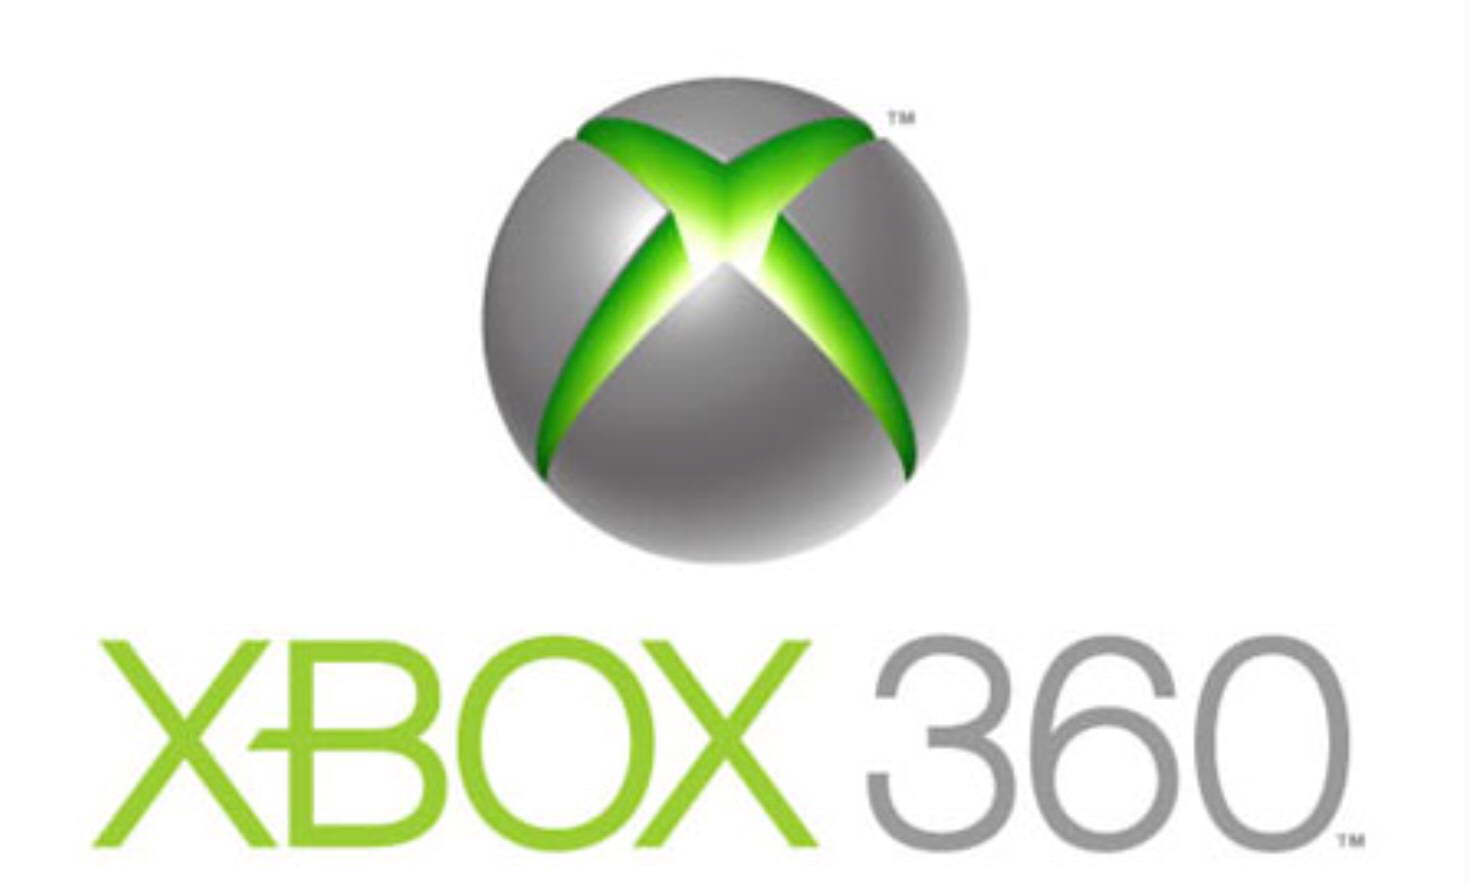 Logo clipart xbox 360 Game XBOX Booth 360 :